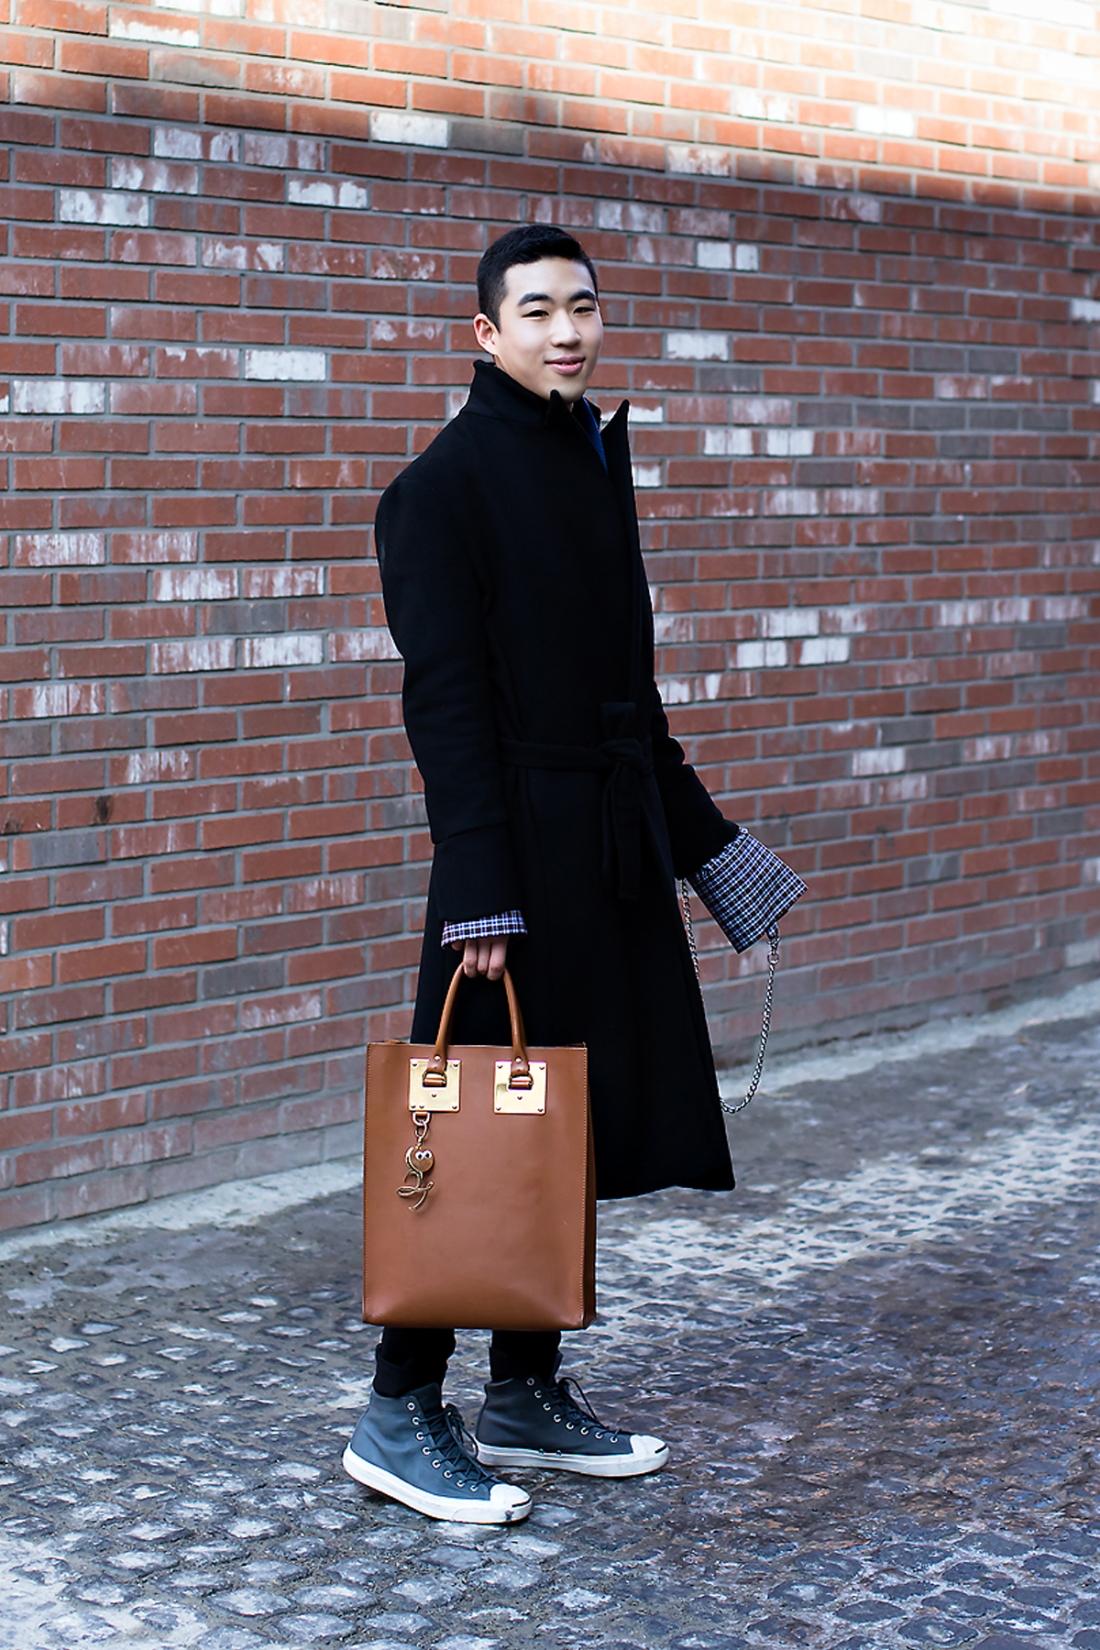 Jang Jonghwan, Street Fashion 2017 in SEOUL.jpg